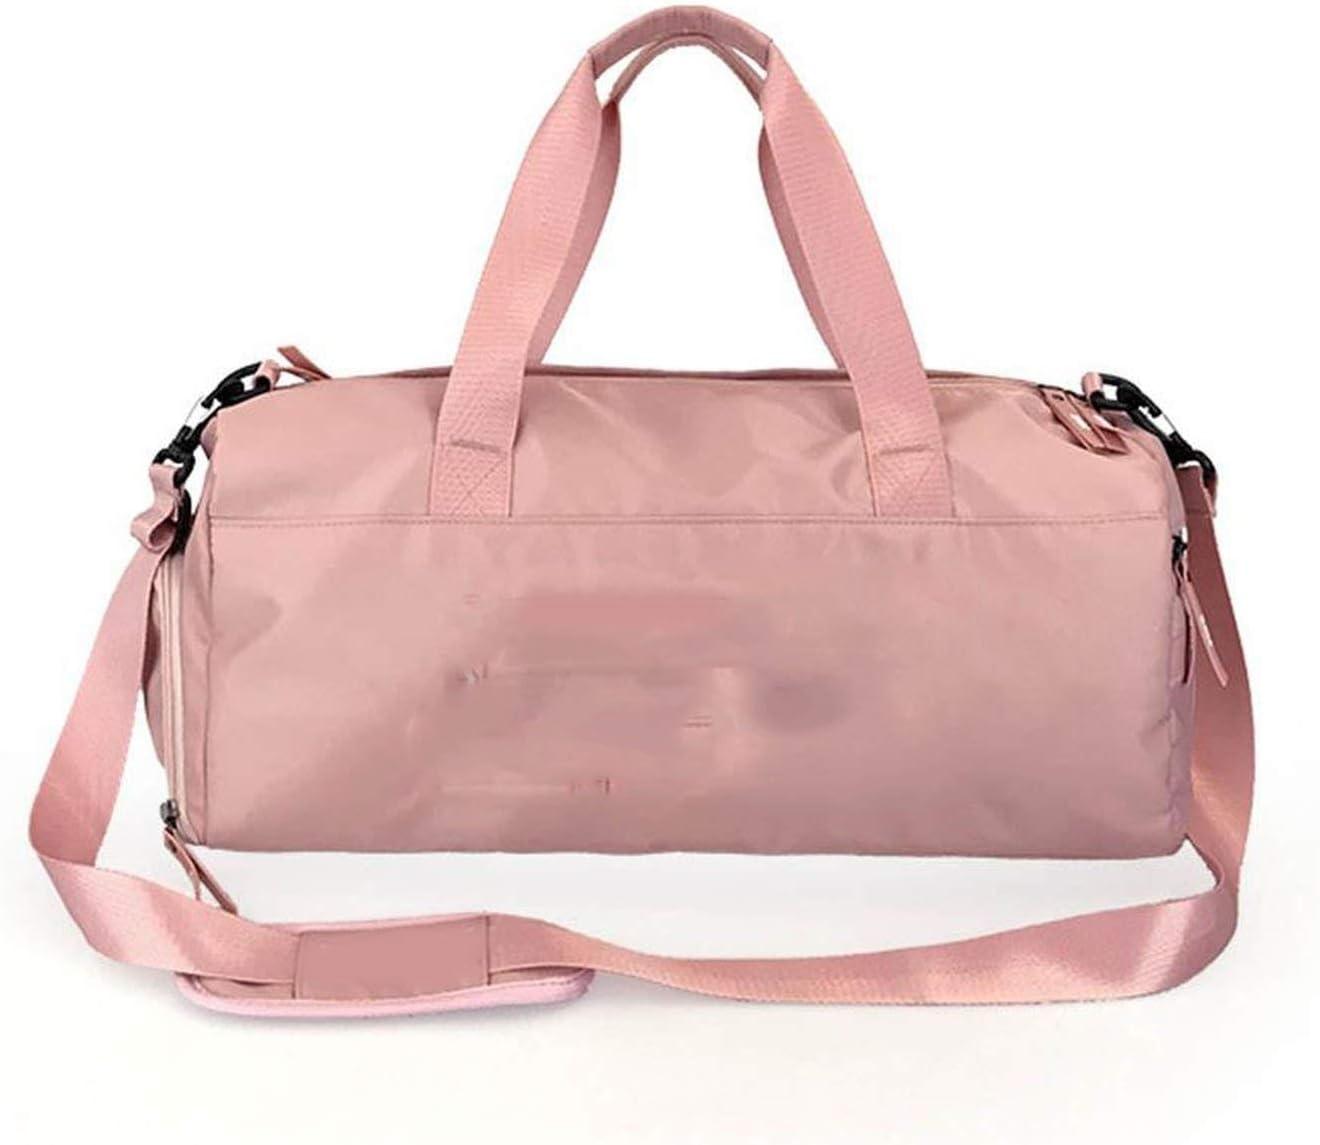 Women Travel Bagmen Women Waterproof Handbag Exercise Fitness Travel Bag Pink Color Sequins Shoulder Bags Portable Large Capacity Messenger Bag,Pink Silver Sequins